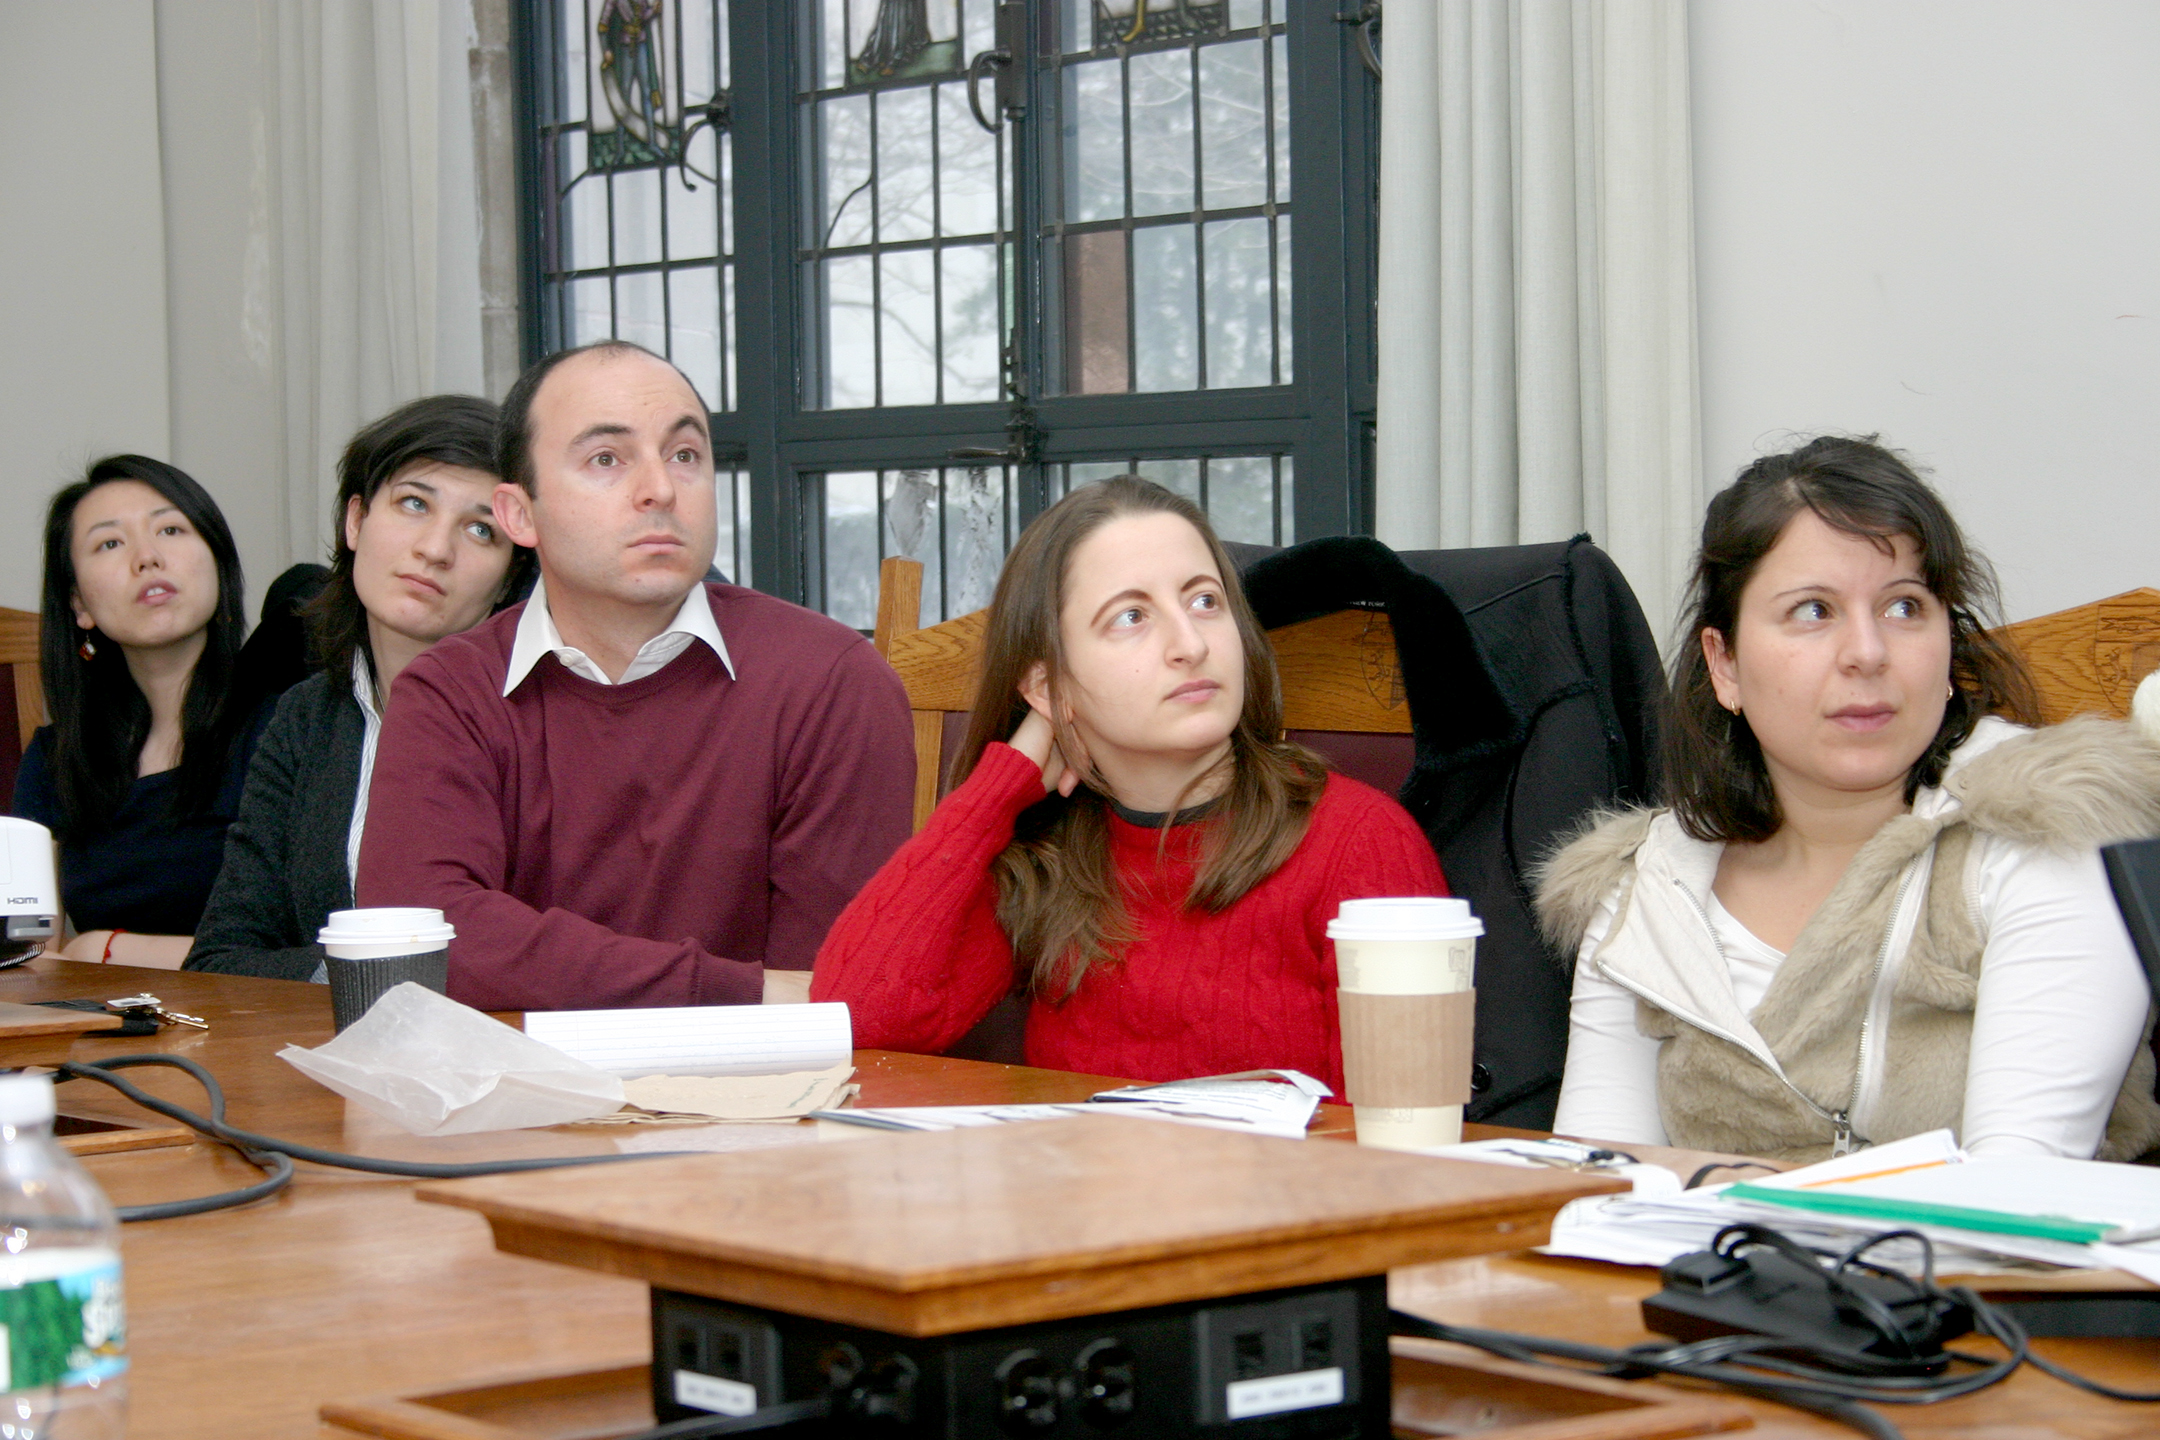 Lang Liu '11, Agnieszka Rafalska '12, YLS Lecturer Noah Messing '00, Laura Cole '12, and Einat Solnik LLM '11